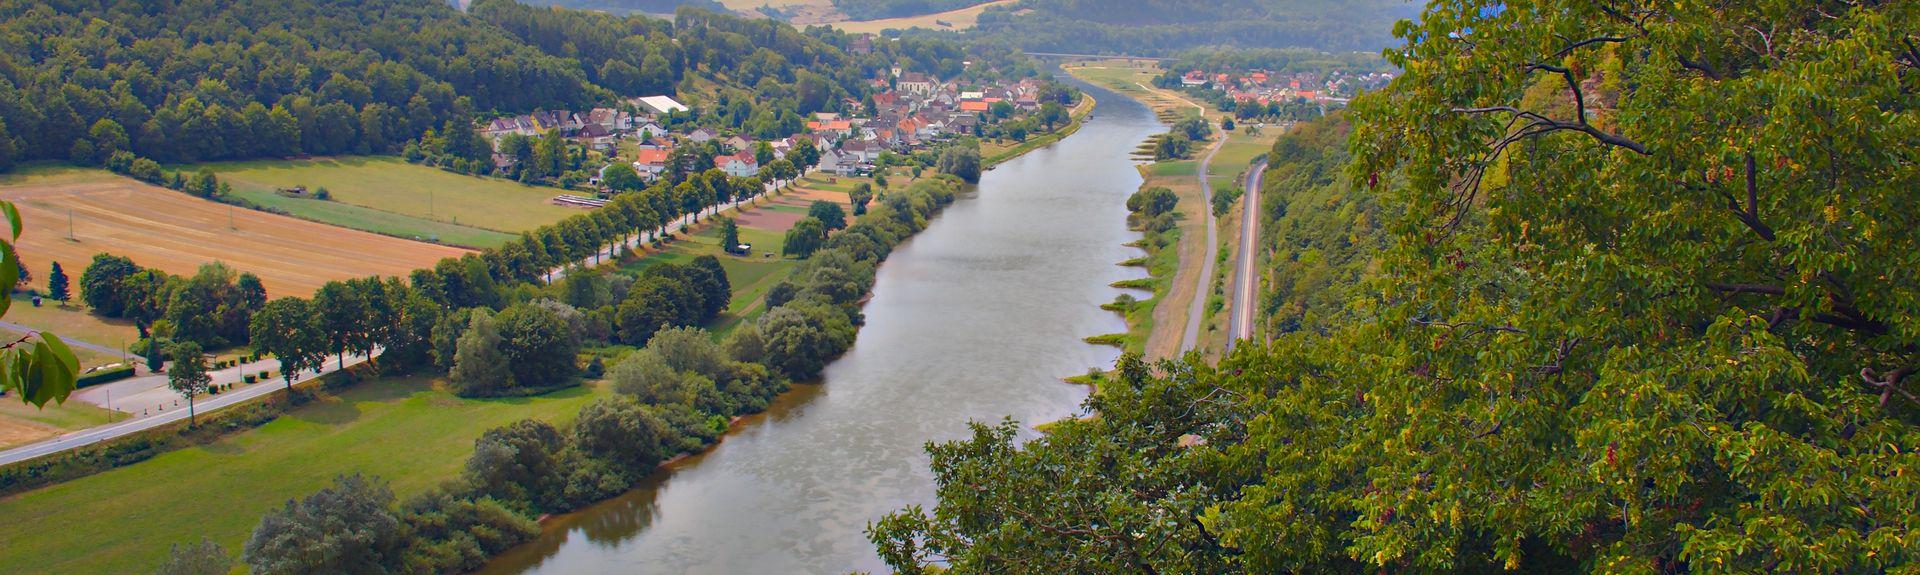 Friedrichsfeld, Trendelburg, Germany